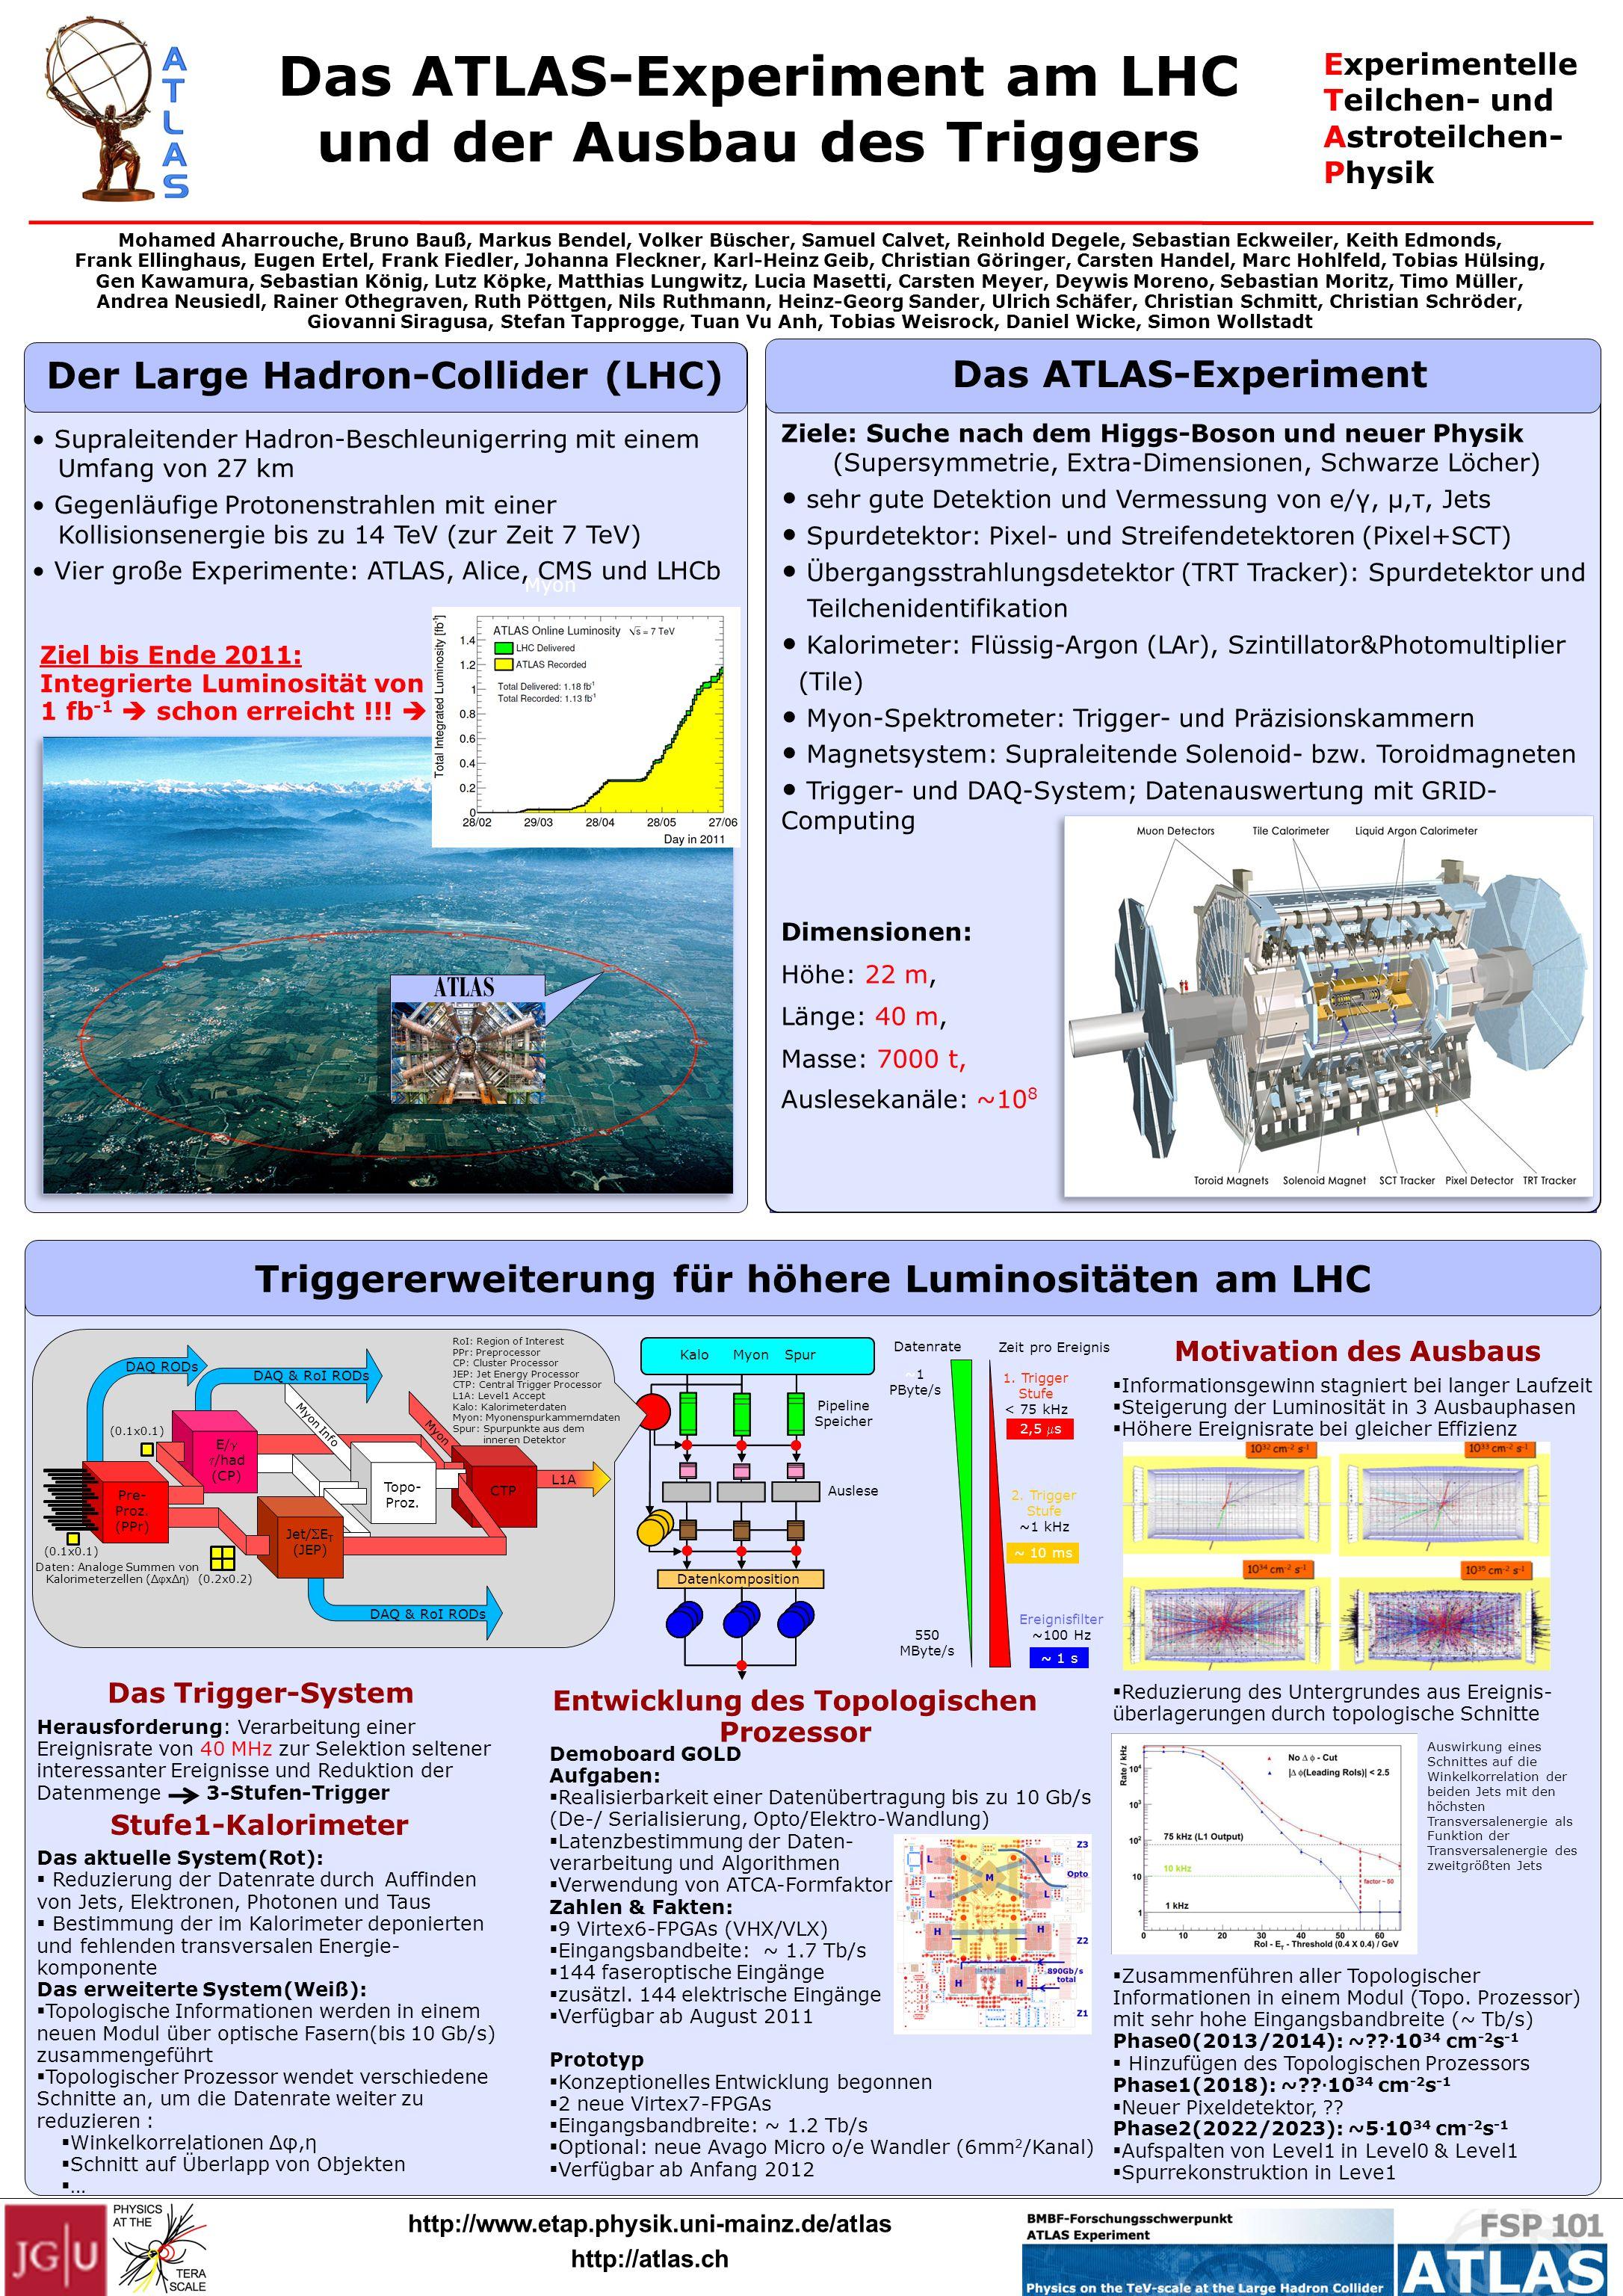 Experimentelle Teilchen- und Astroteilchen- Physik http://www.etap.physik.uni-mainz.de/atlas http://atlas.ch Der Large Hadron-Collider (LHC) Supraleit